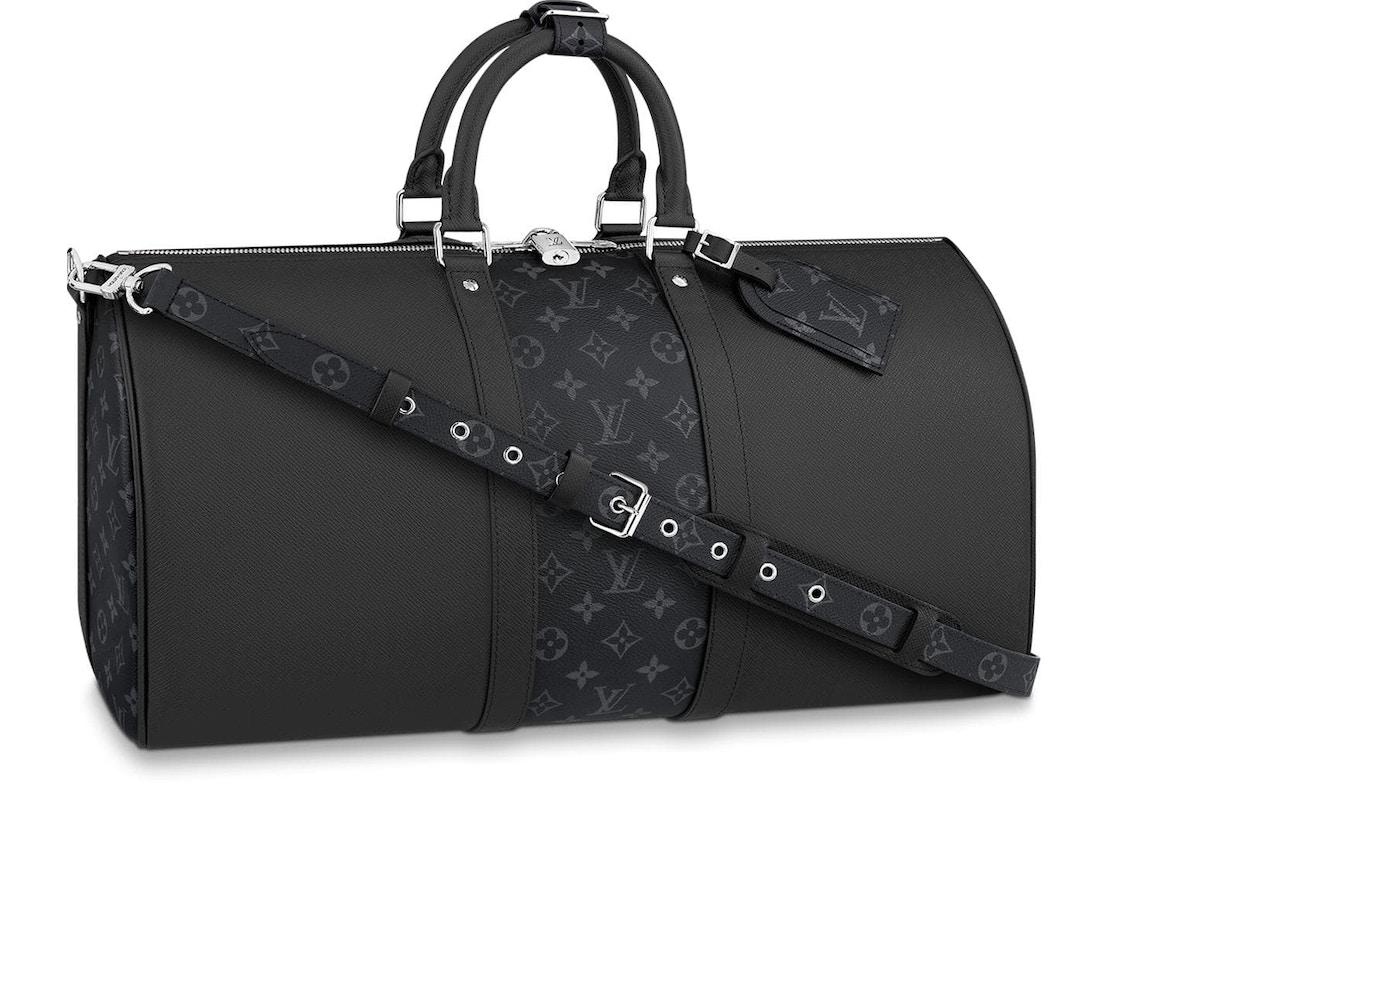 e6270a8789b Buy & Sell Luxury Handbags - Average Sale Price